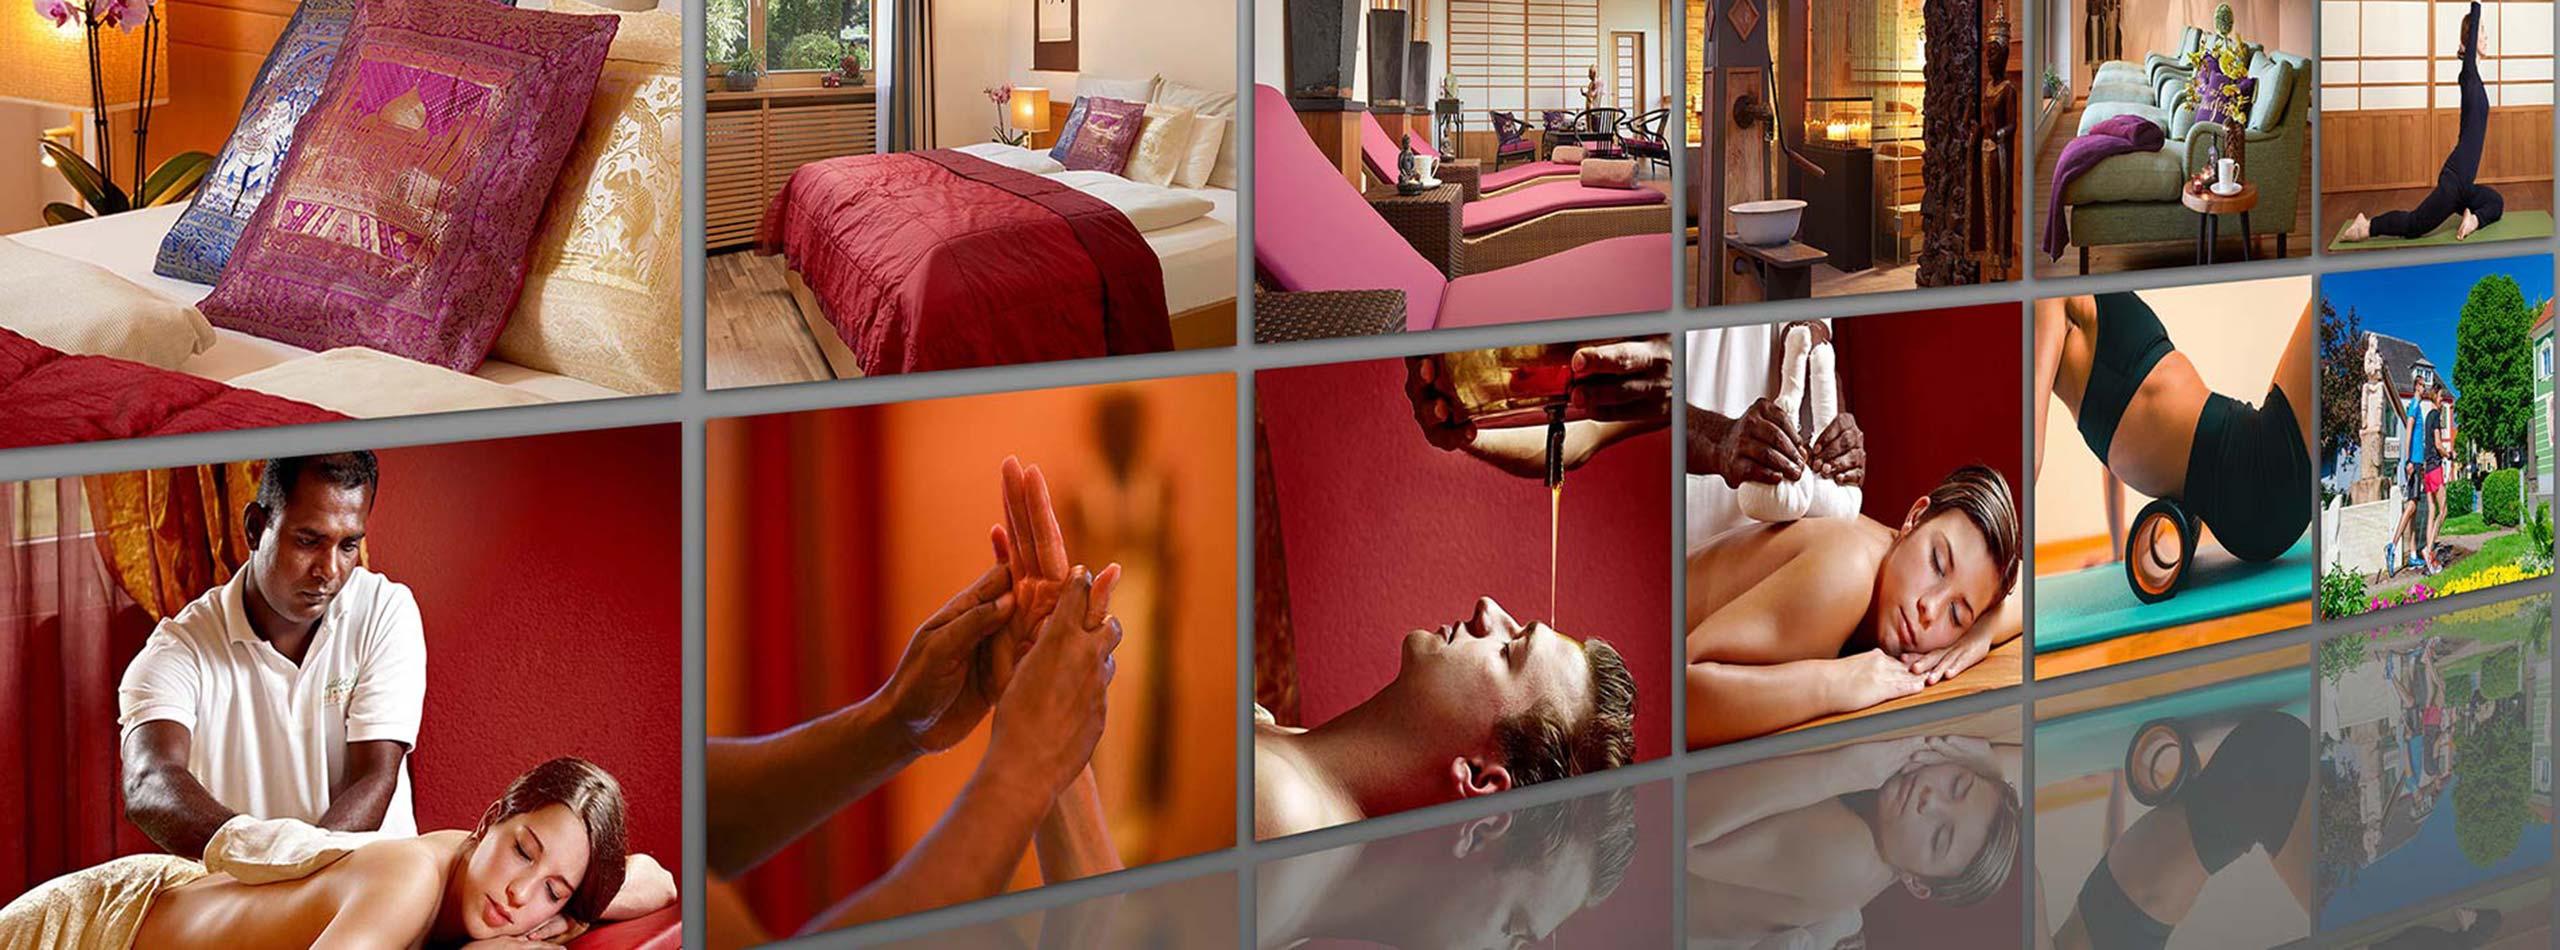 Ayurveda Resort Mandira in Austria